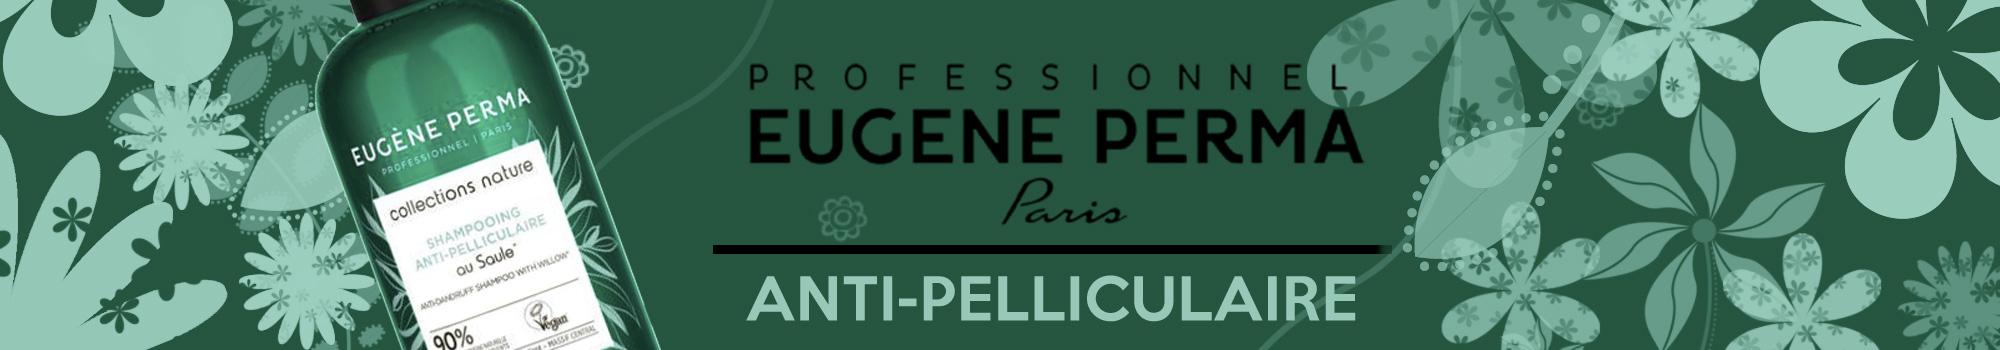 Collections Nature Anti-Pelliculaire Eugène Perma